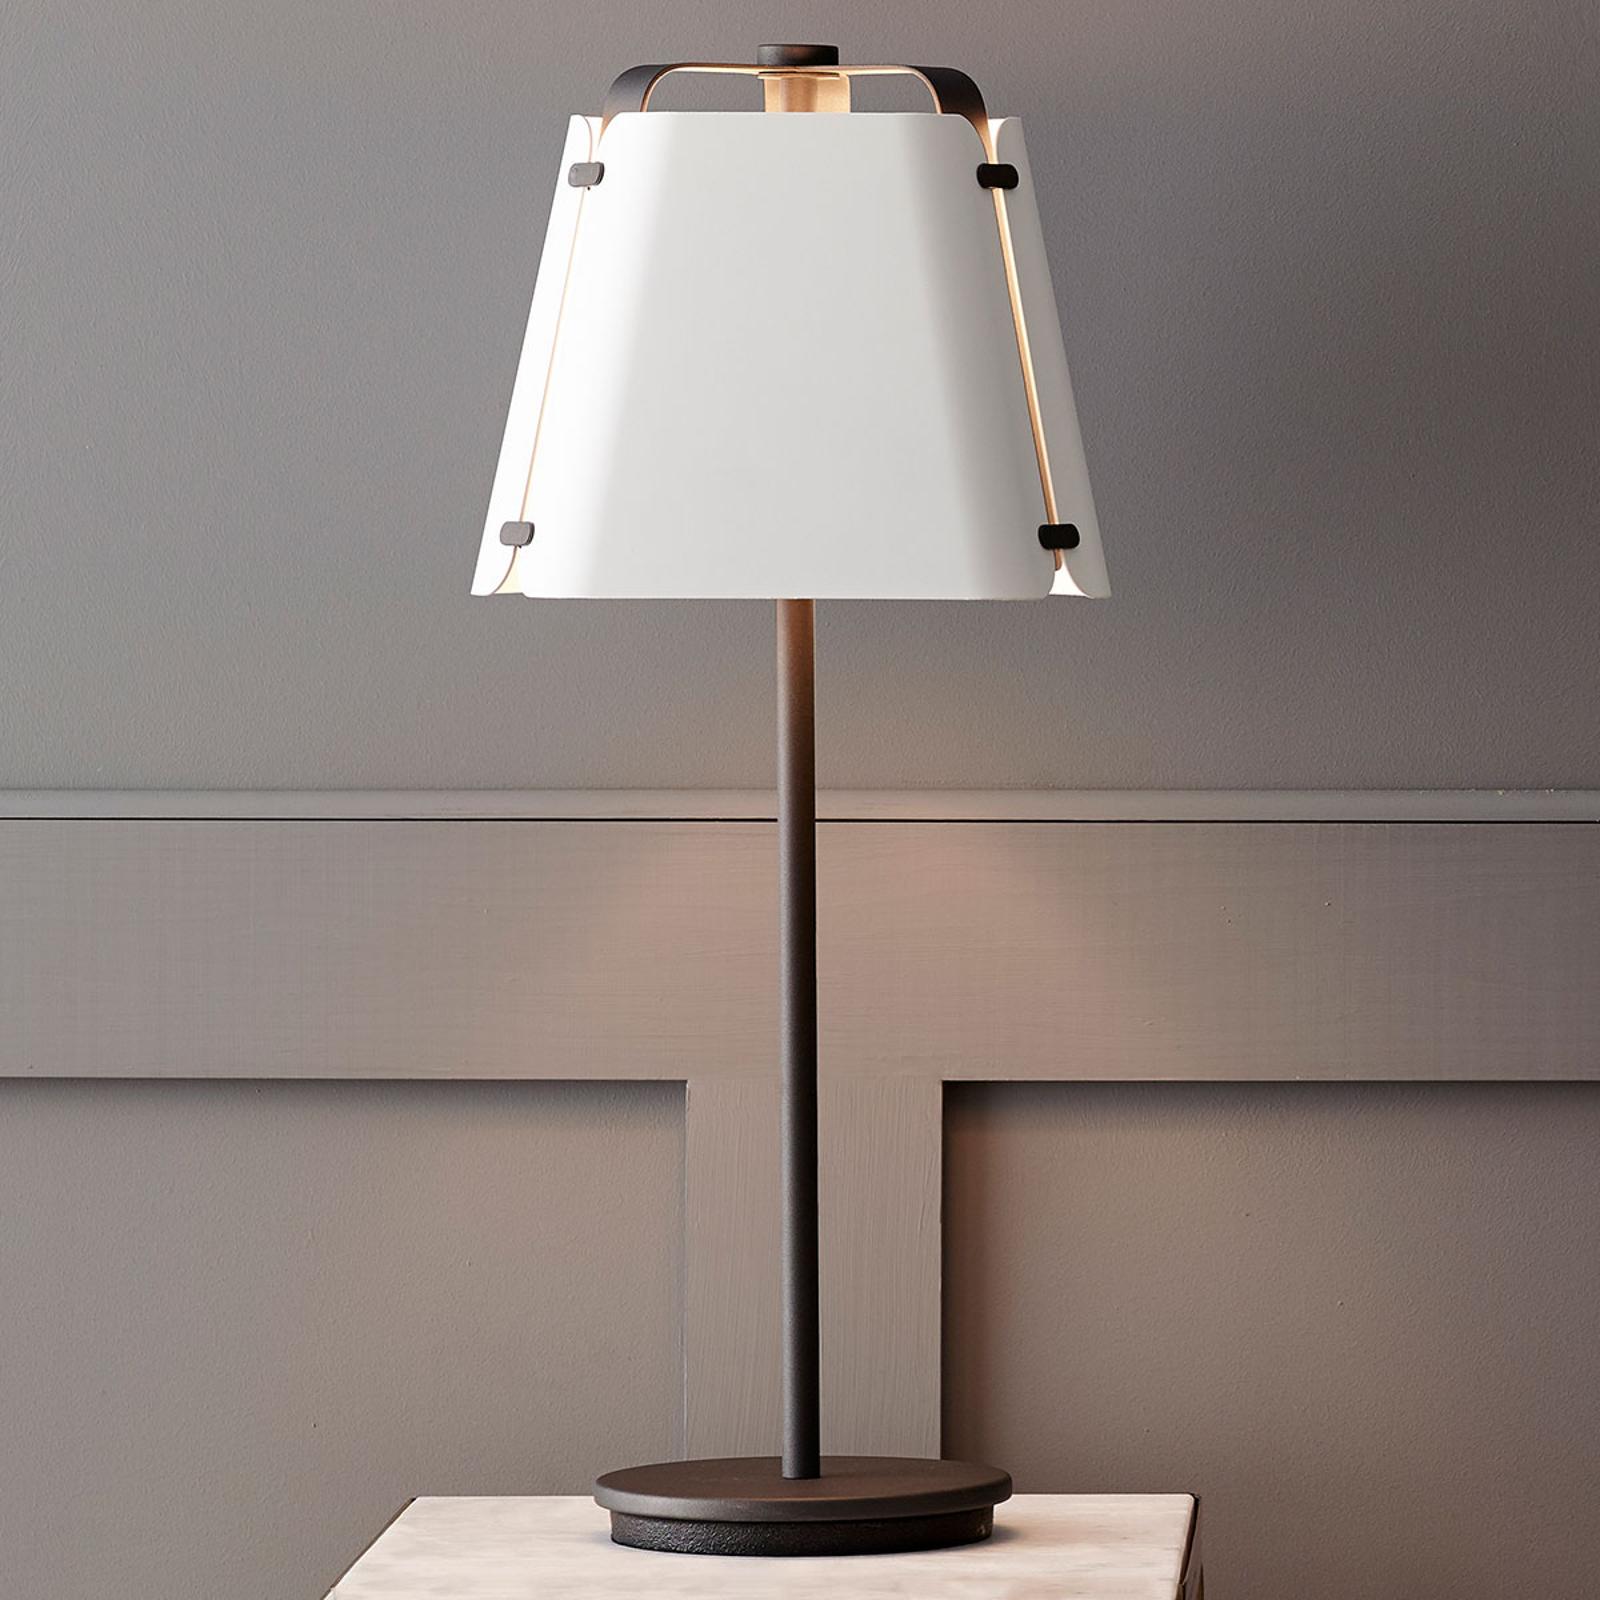 Fold bordlampe, metal